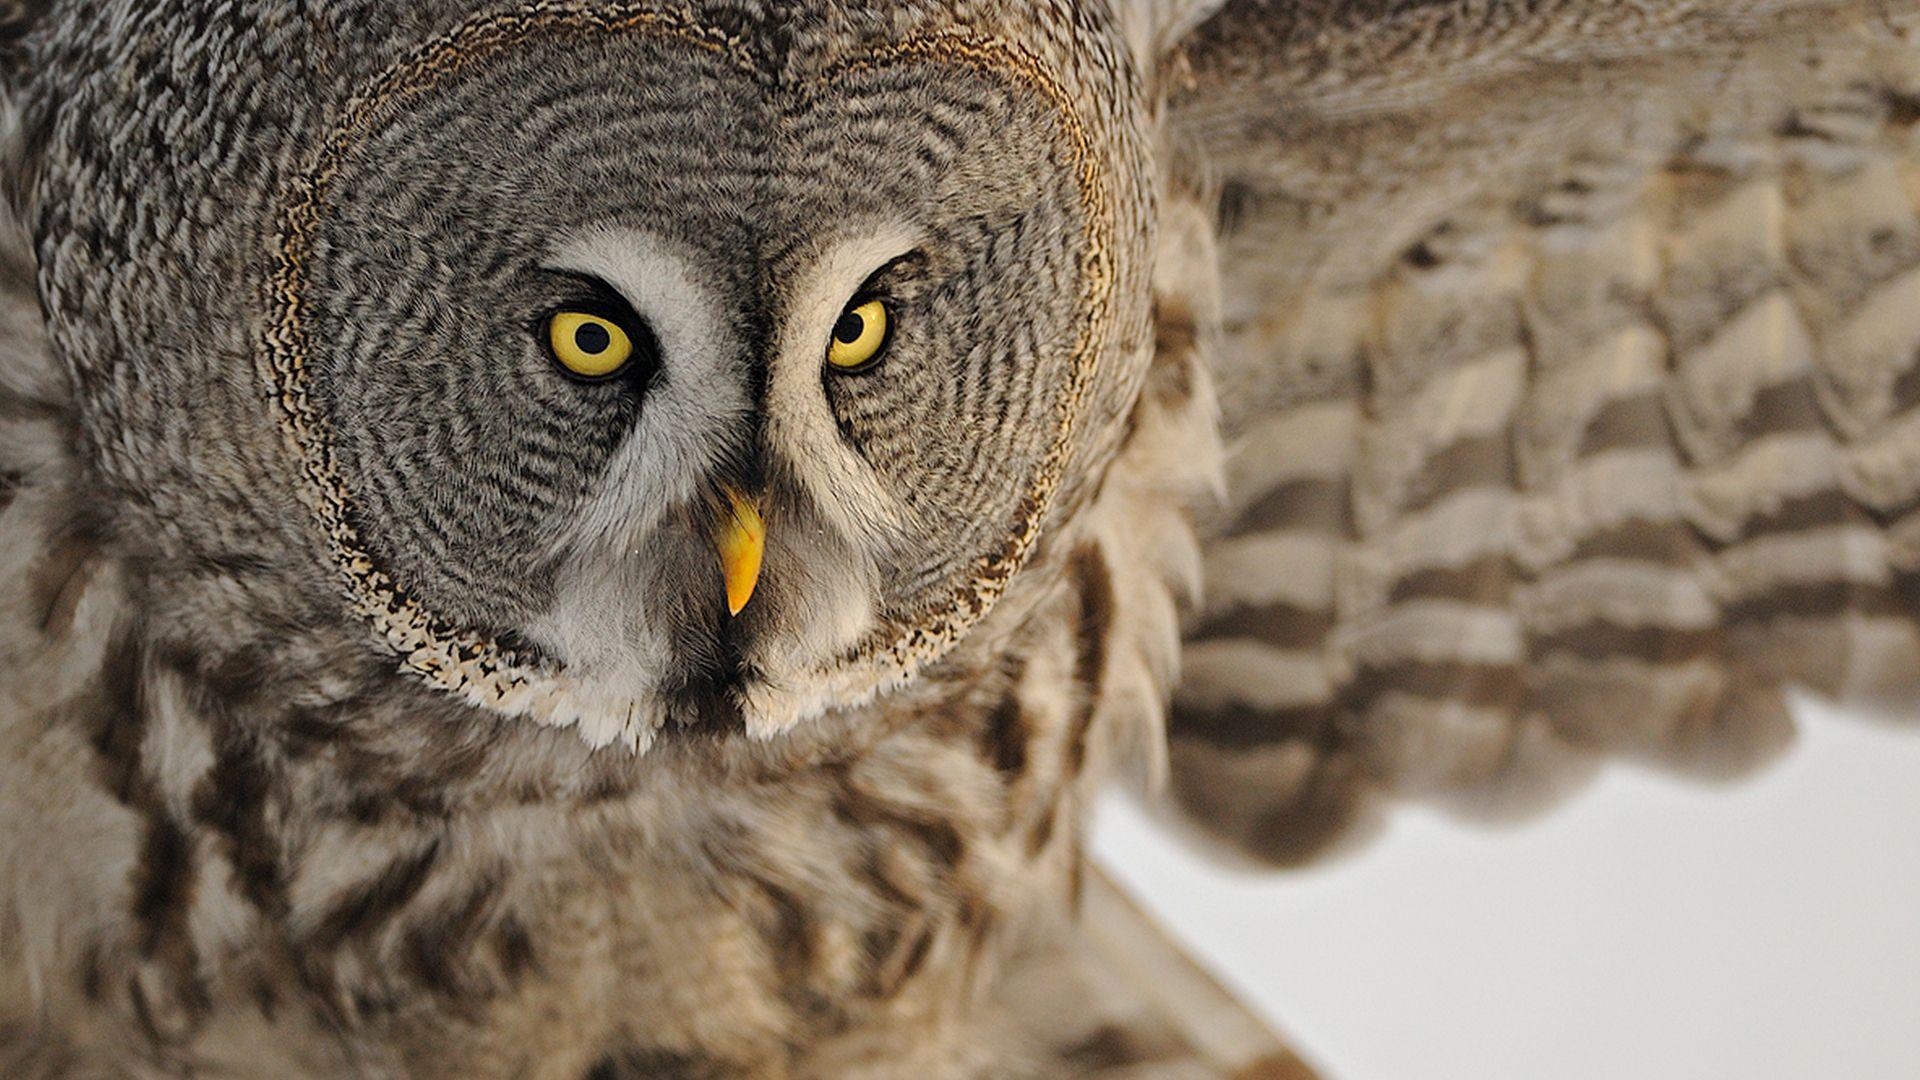 Head Owl